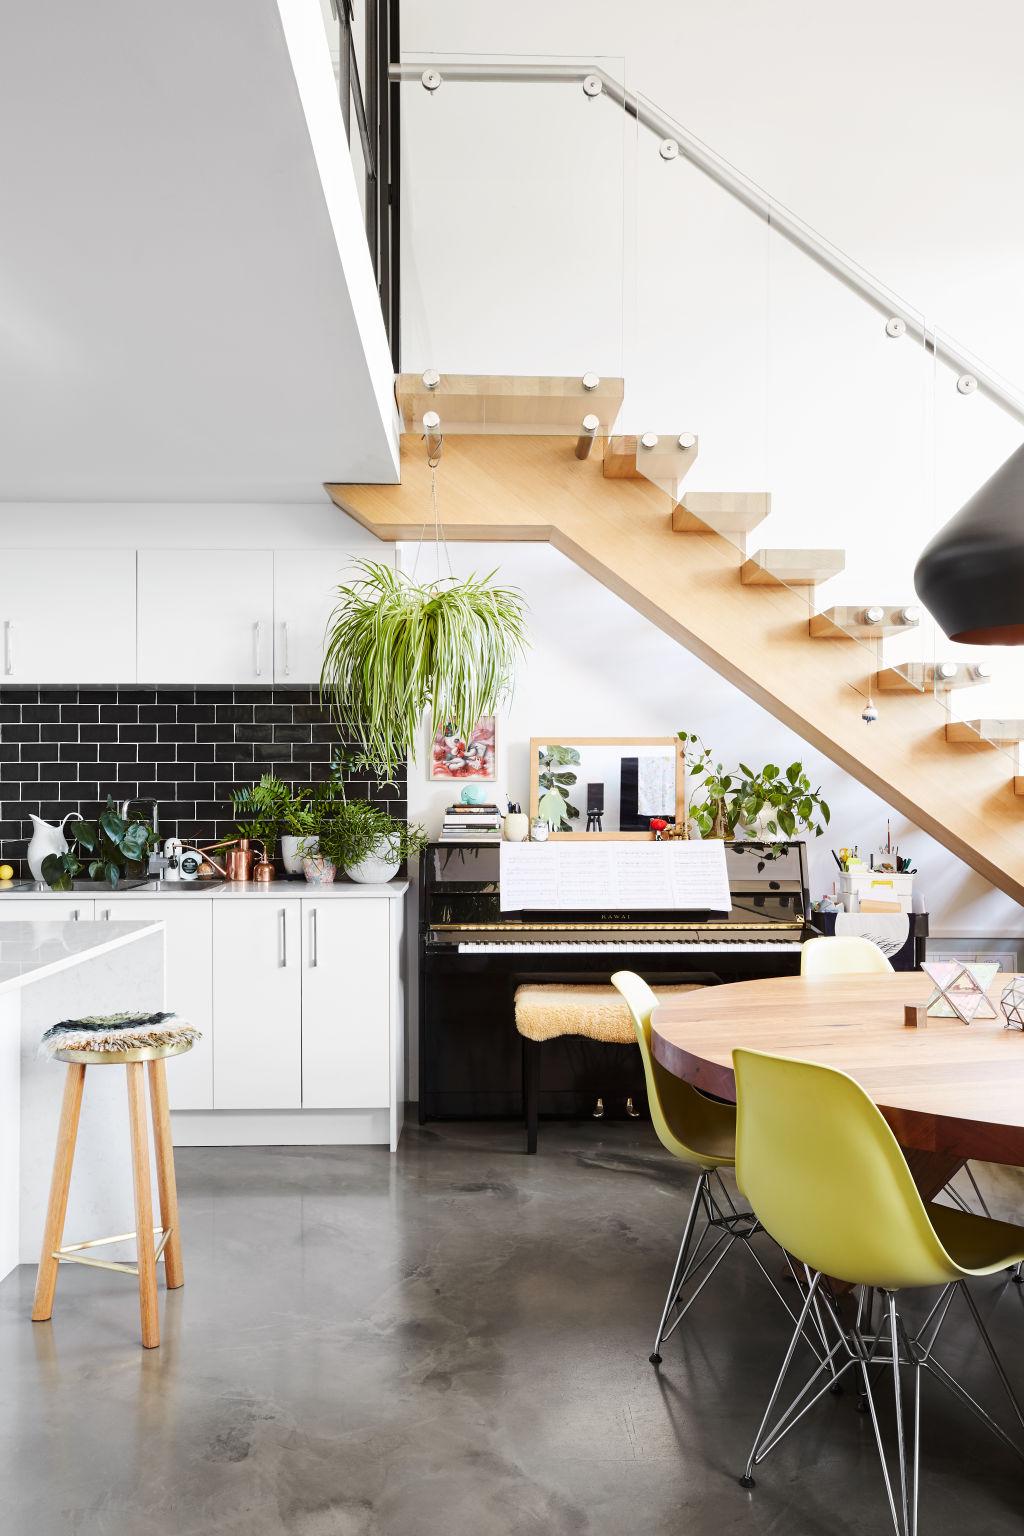 Home Work with Jason Fox